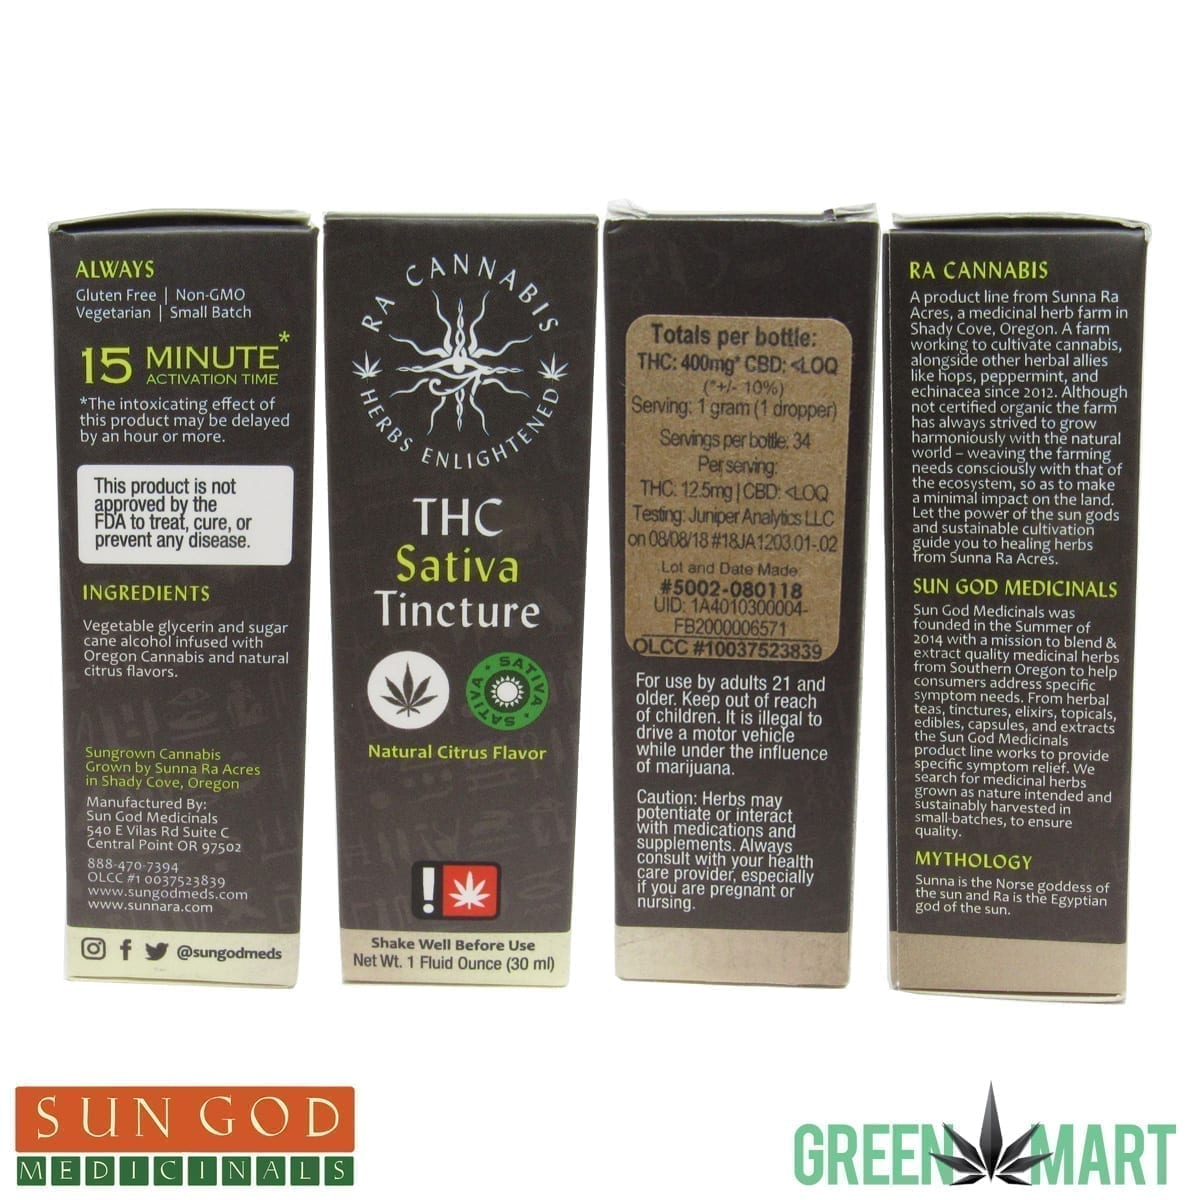 Ra Cannabis THC Sativa Tincture